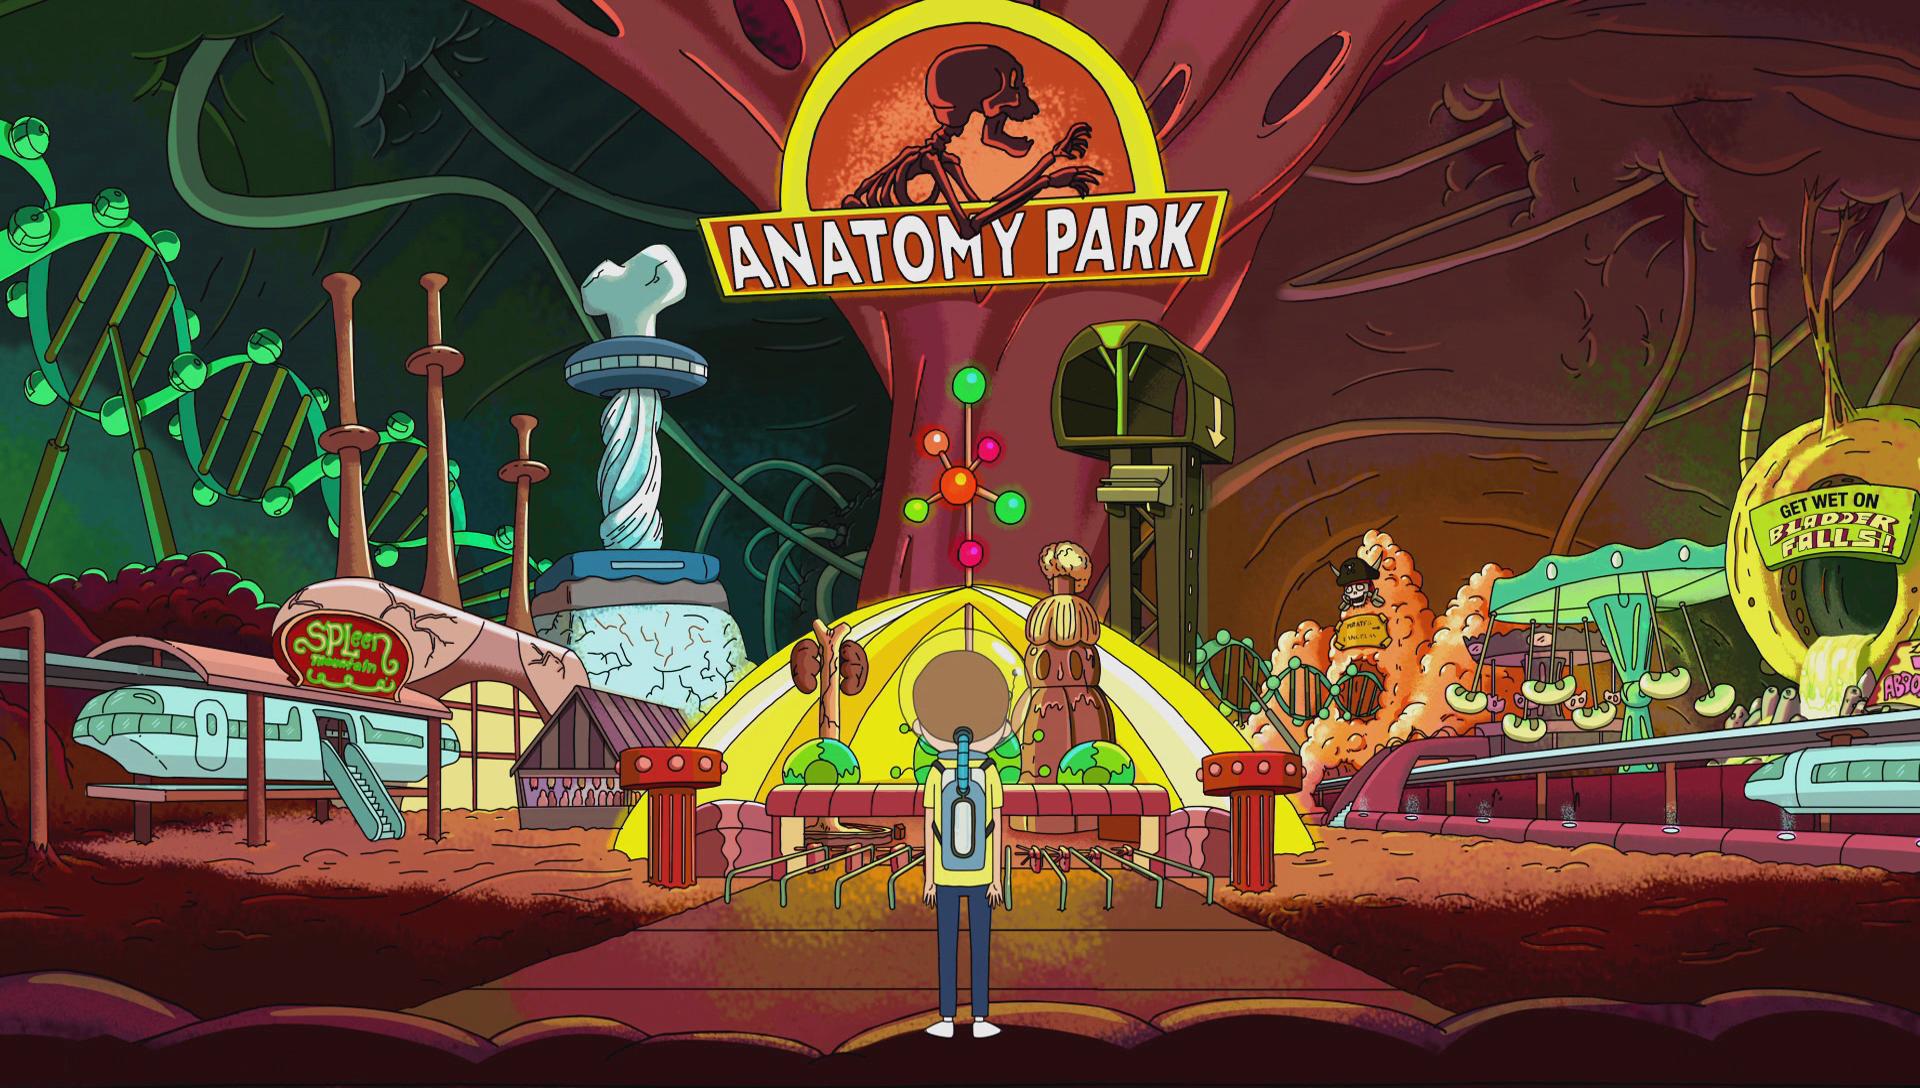 Rick And Morty Anatomy Park Board Game Launching July 12 Gizorama Anatomy Park Rick And Morty Poster Rick And Morty Season